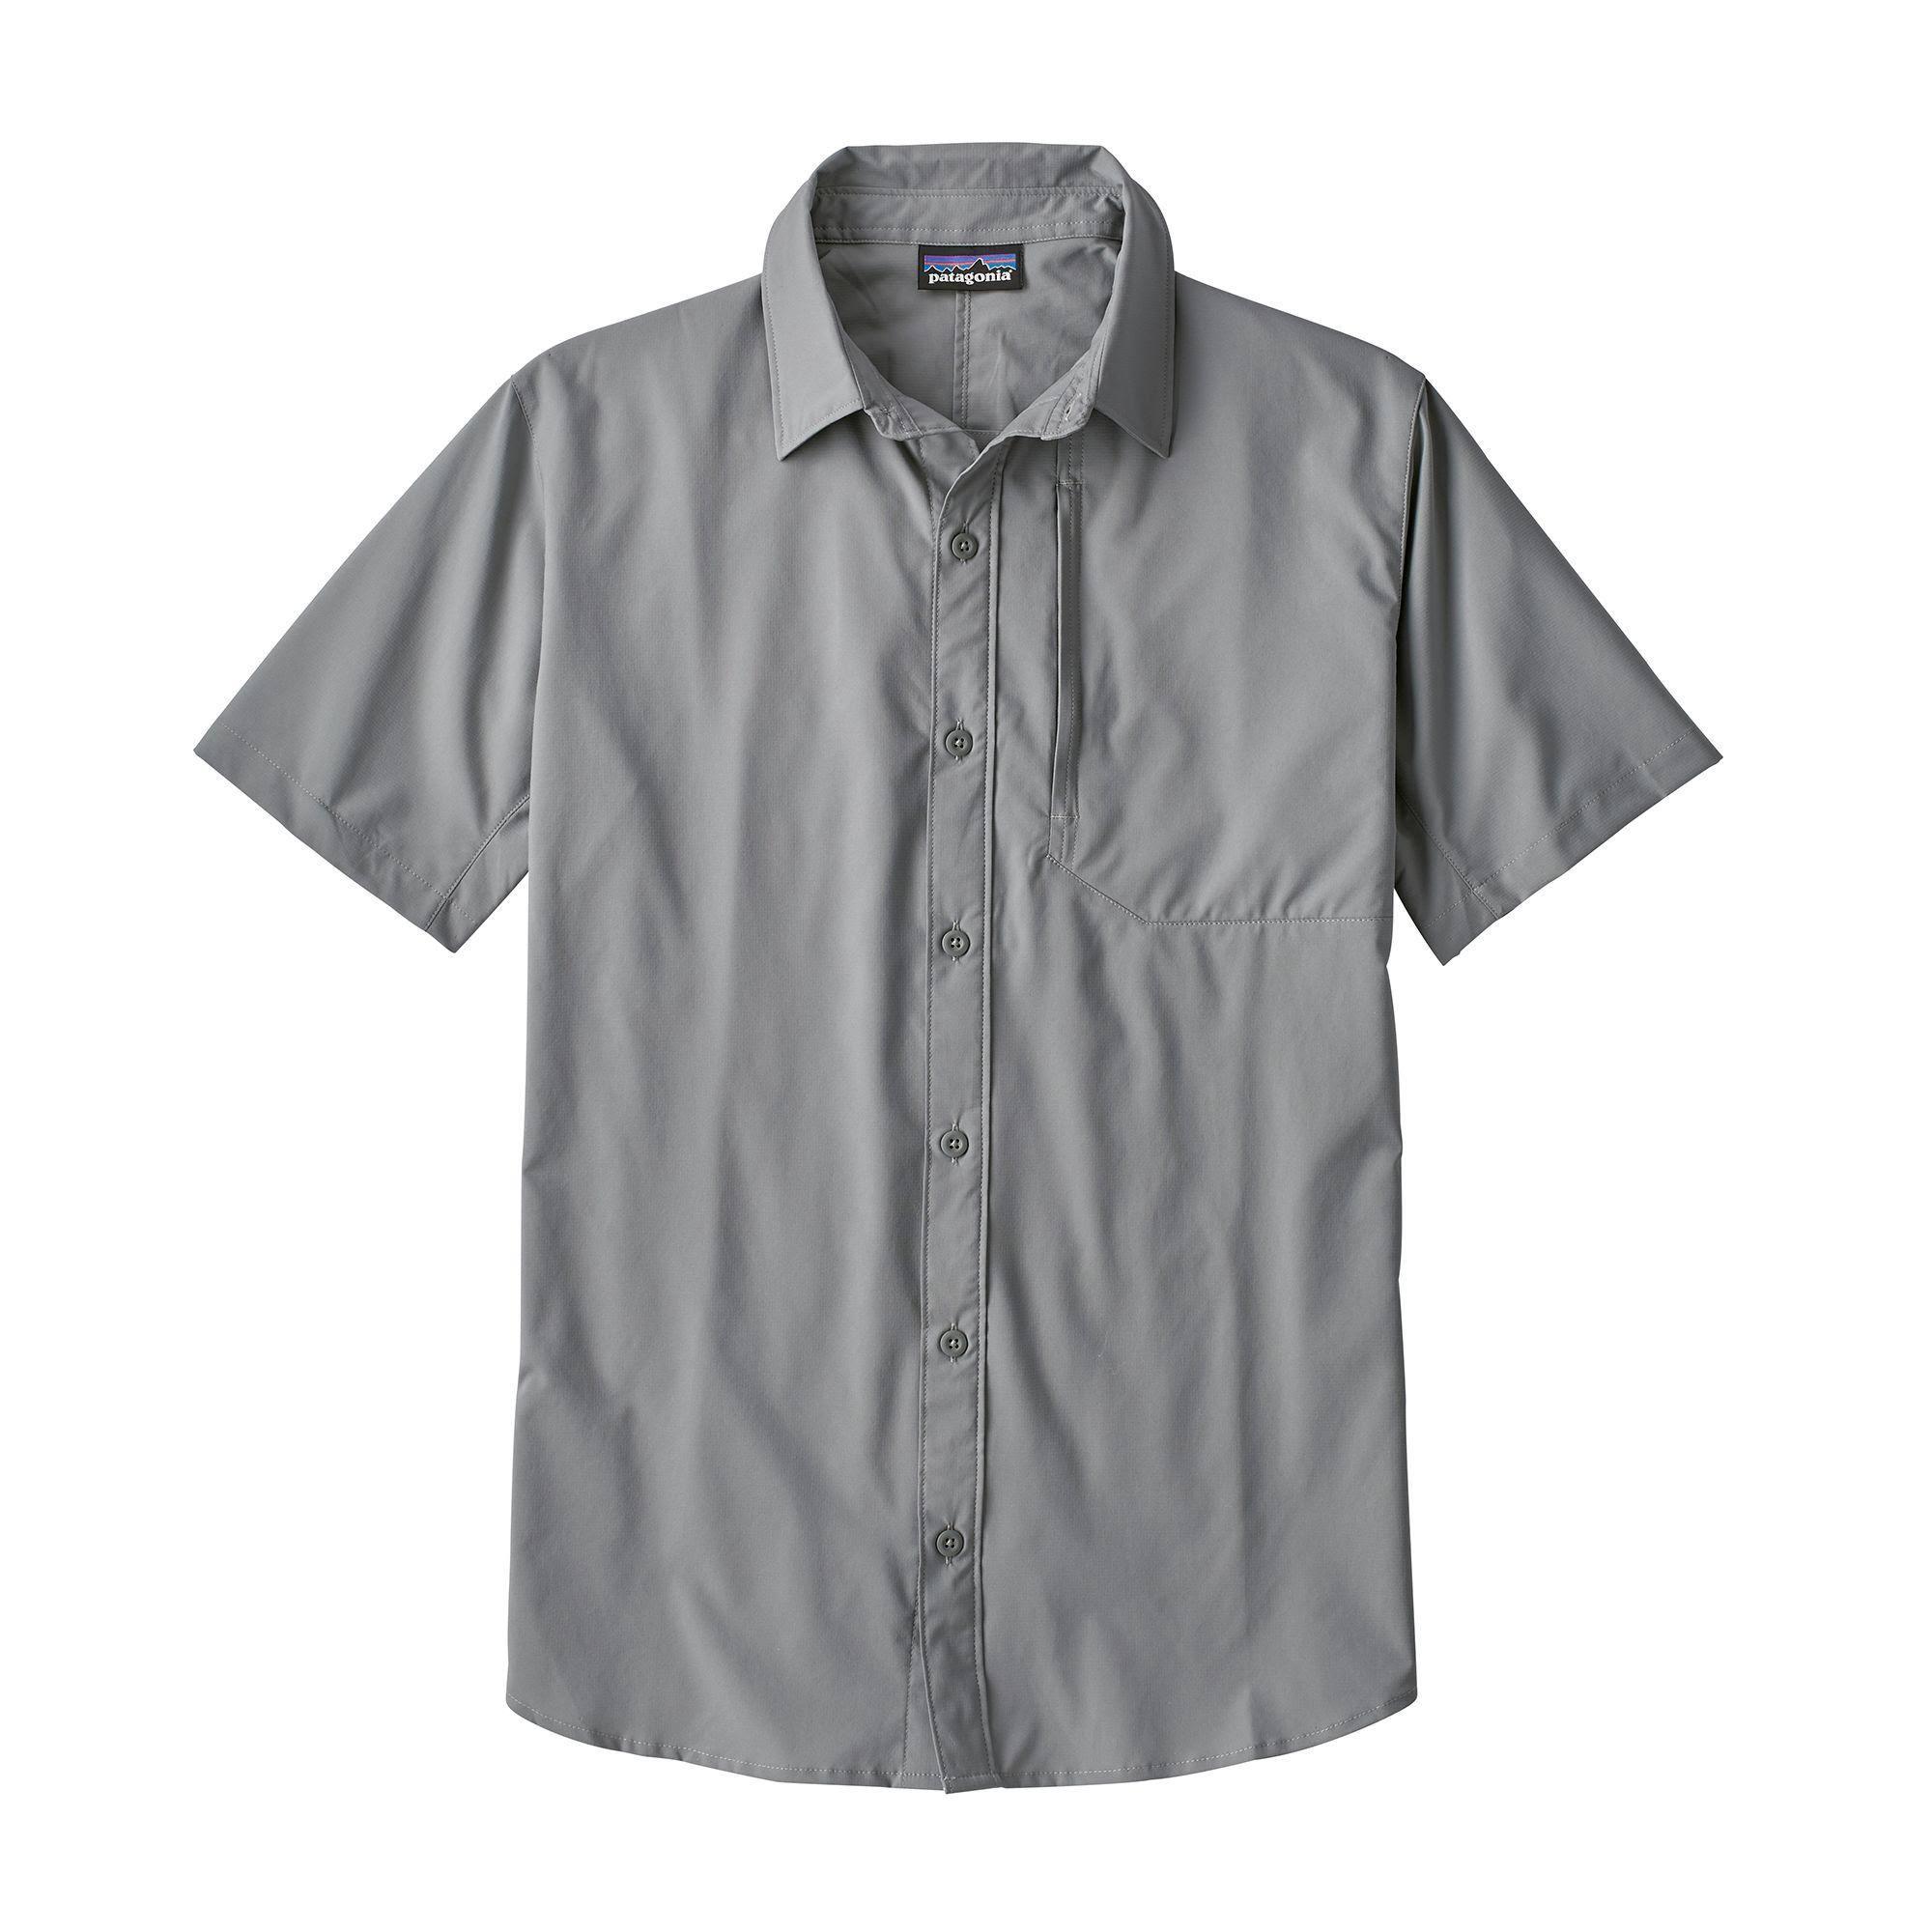 Skiddore Shirt Patagonia 53435 Herren M Grau 0gxwqOA5